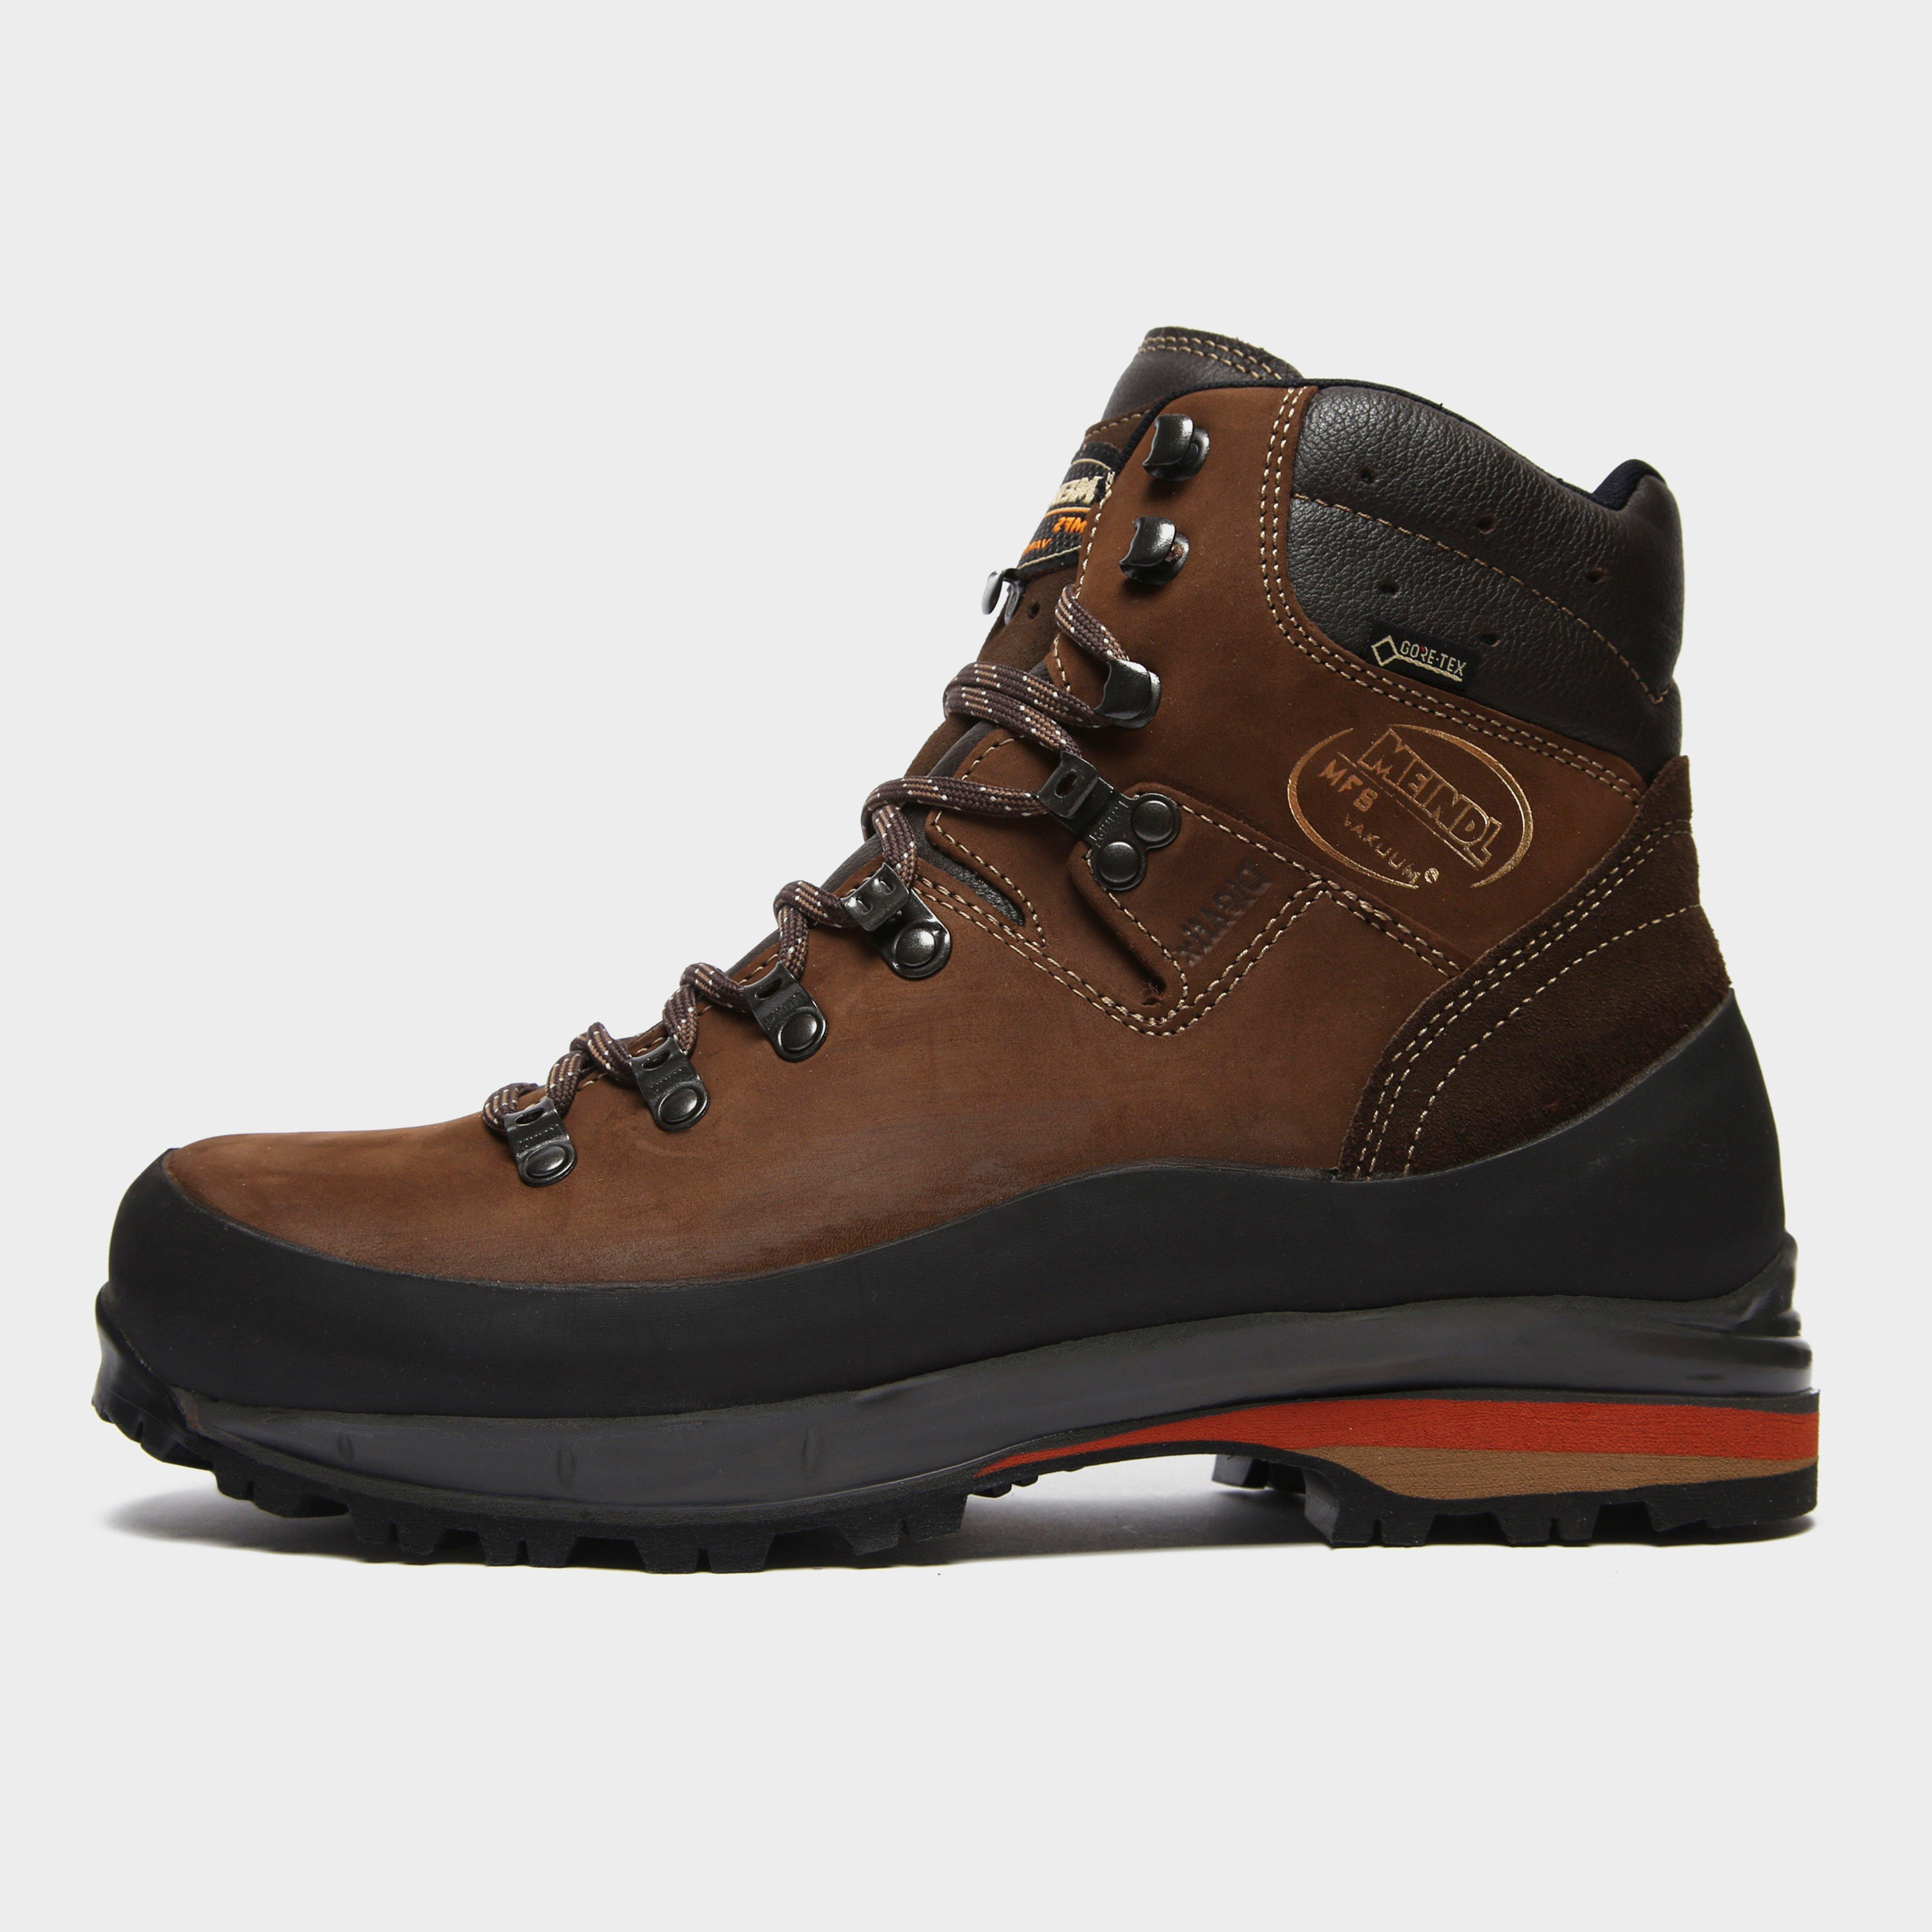 Meindl Meindl Mens Vakuum GORE-TEX Walking Boots, Brown